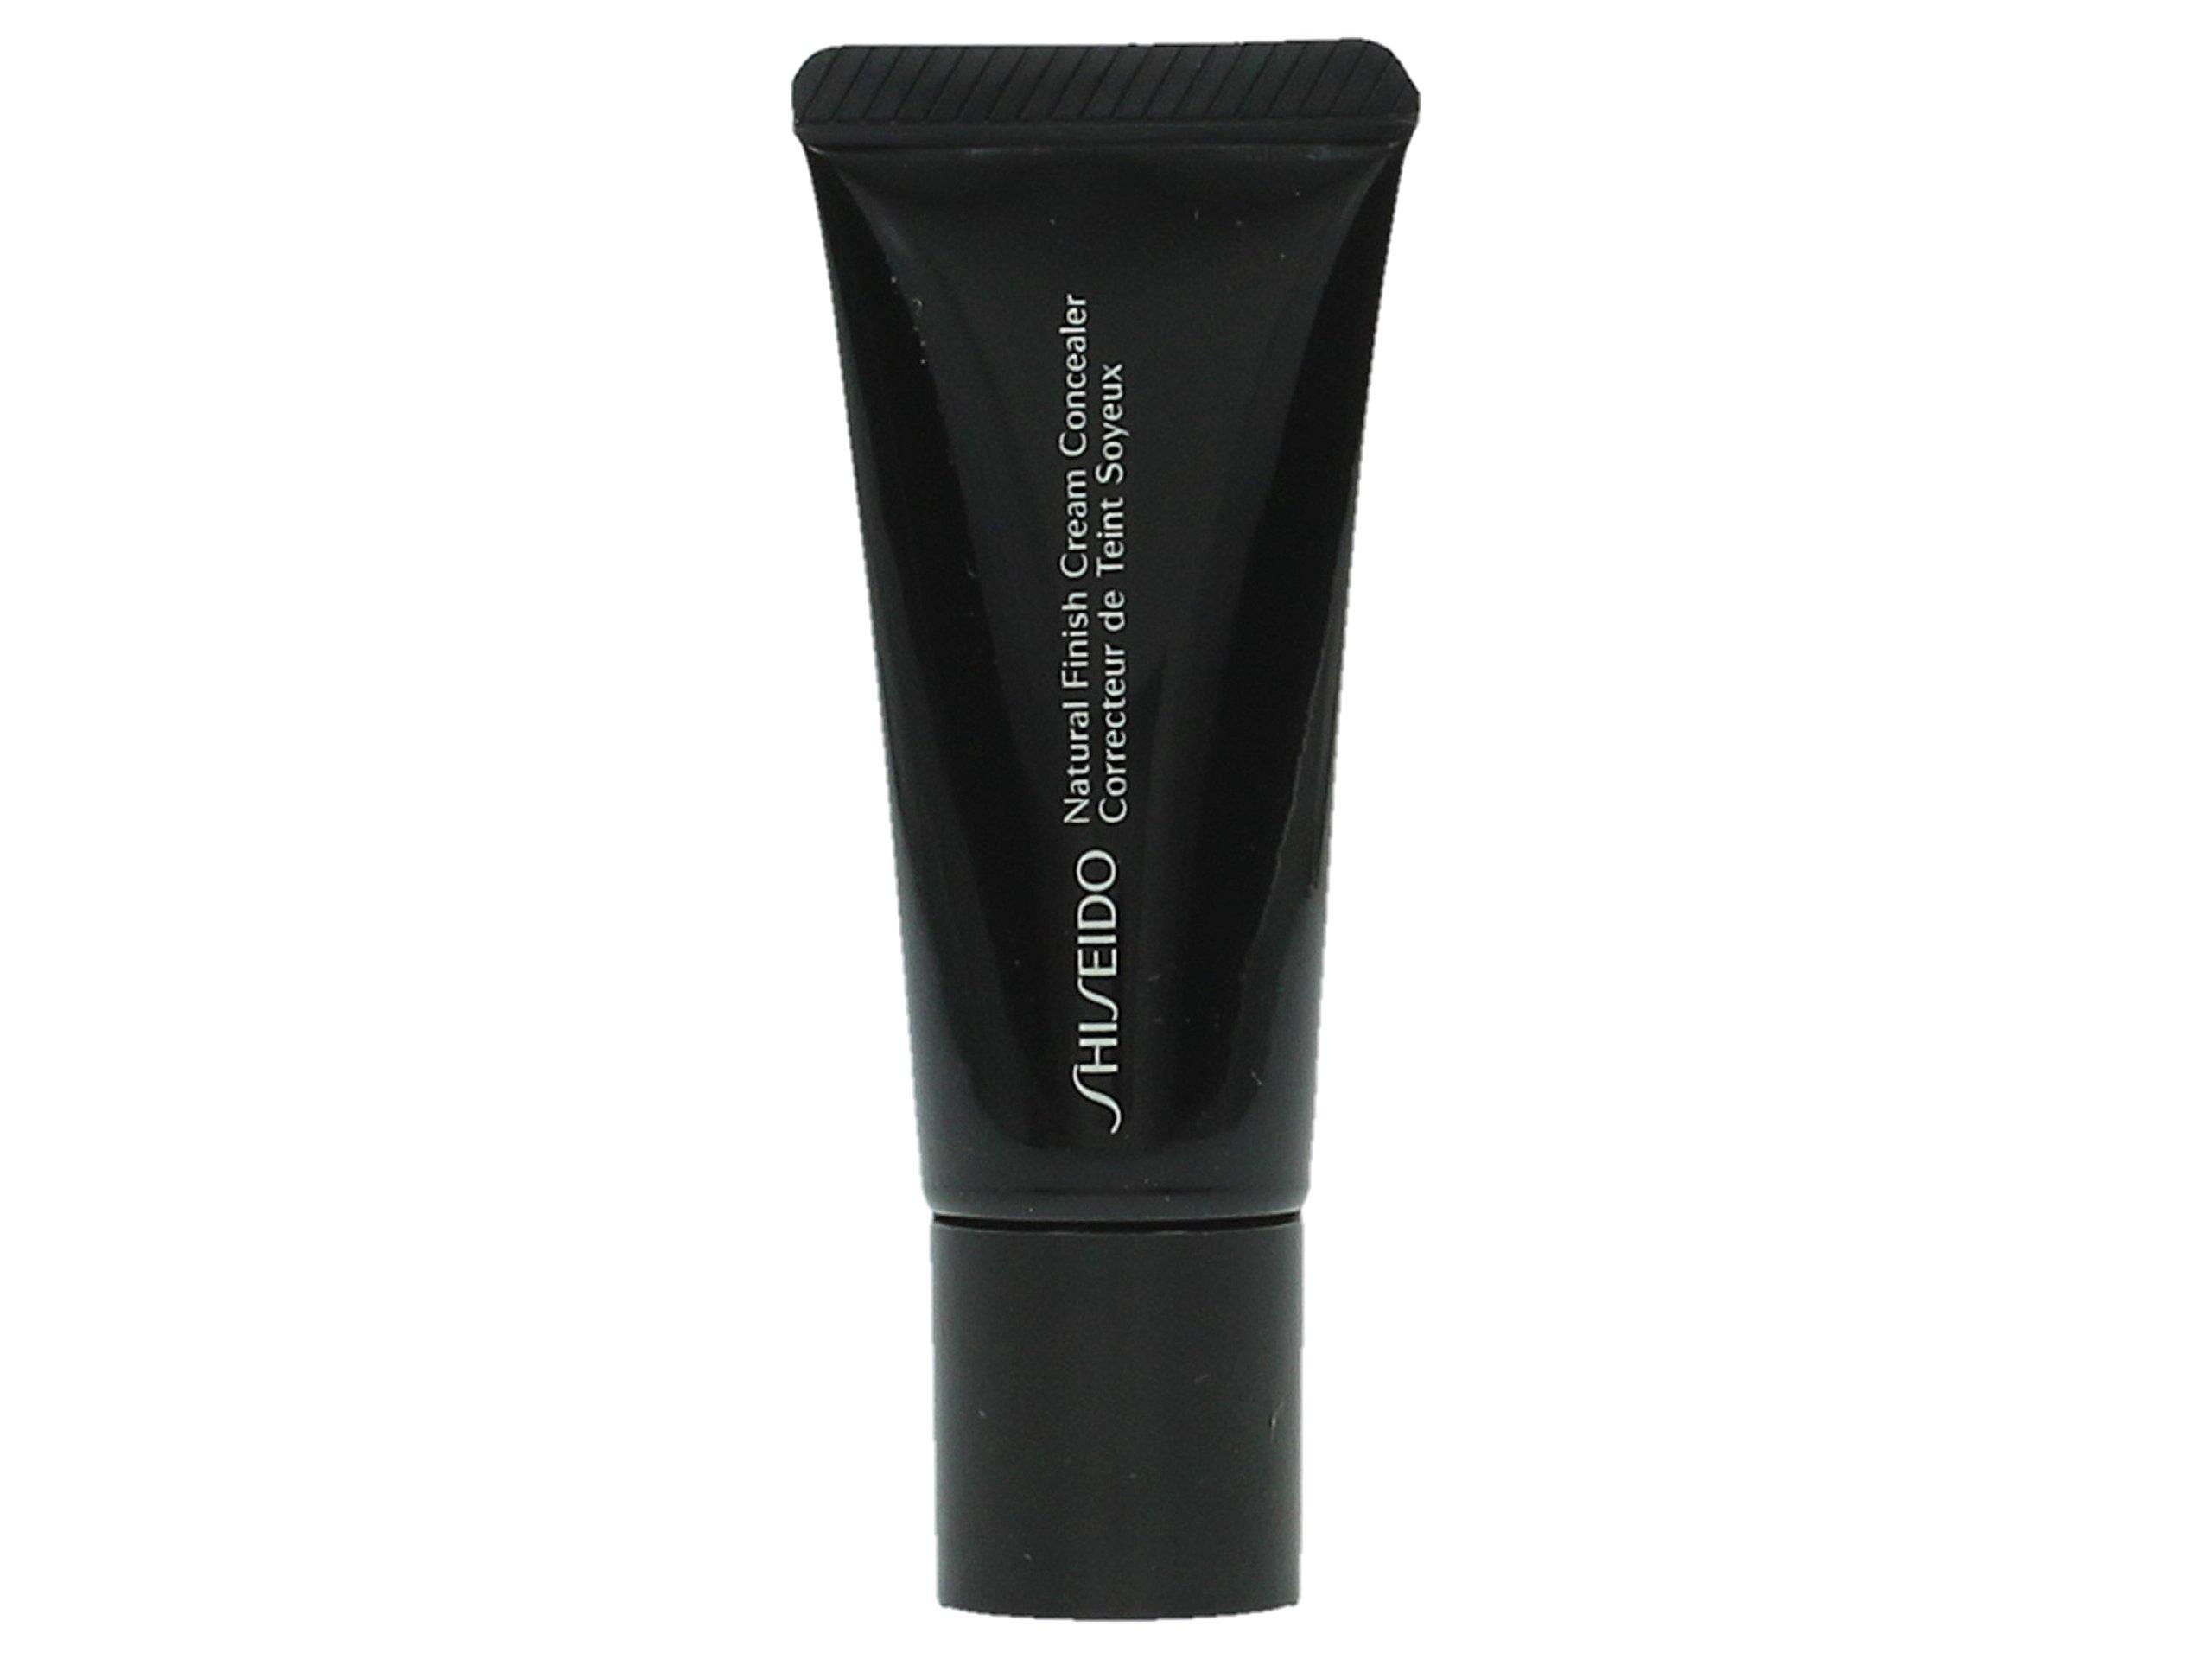 Shiseido Natural Finish Cream Concealer for Women, 3B/Medium Beige, 0.44 Ounce